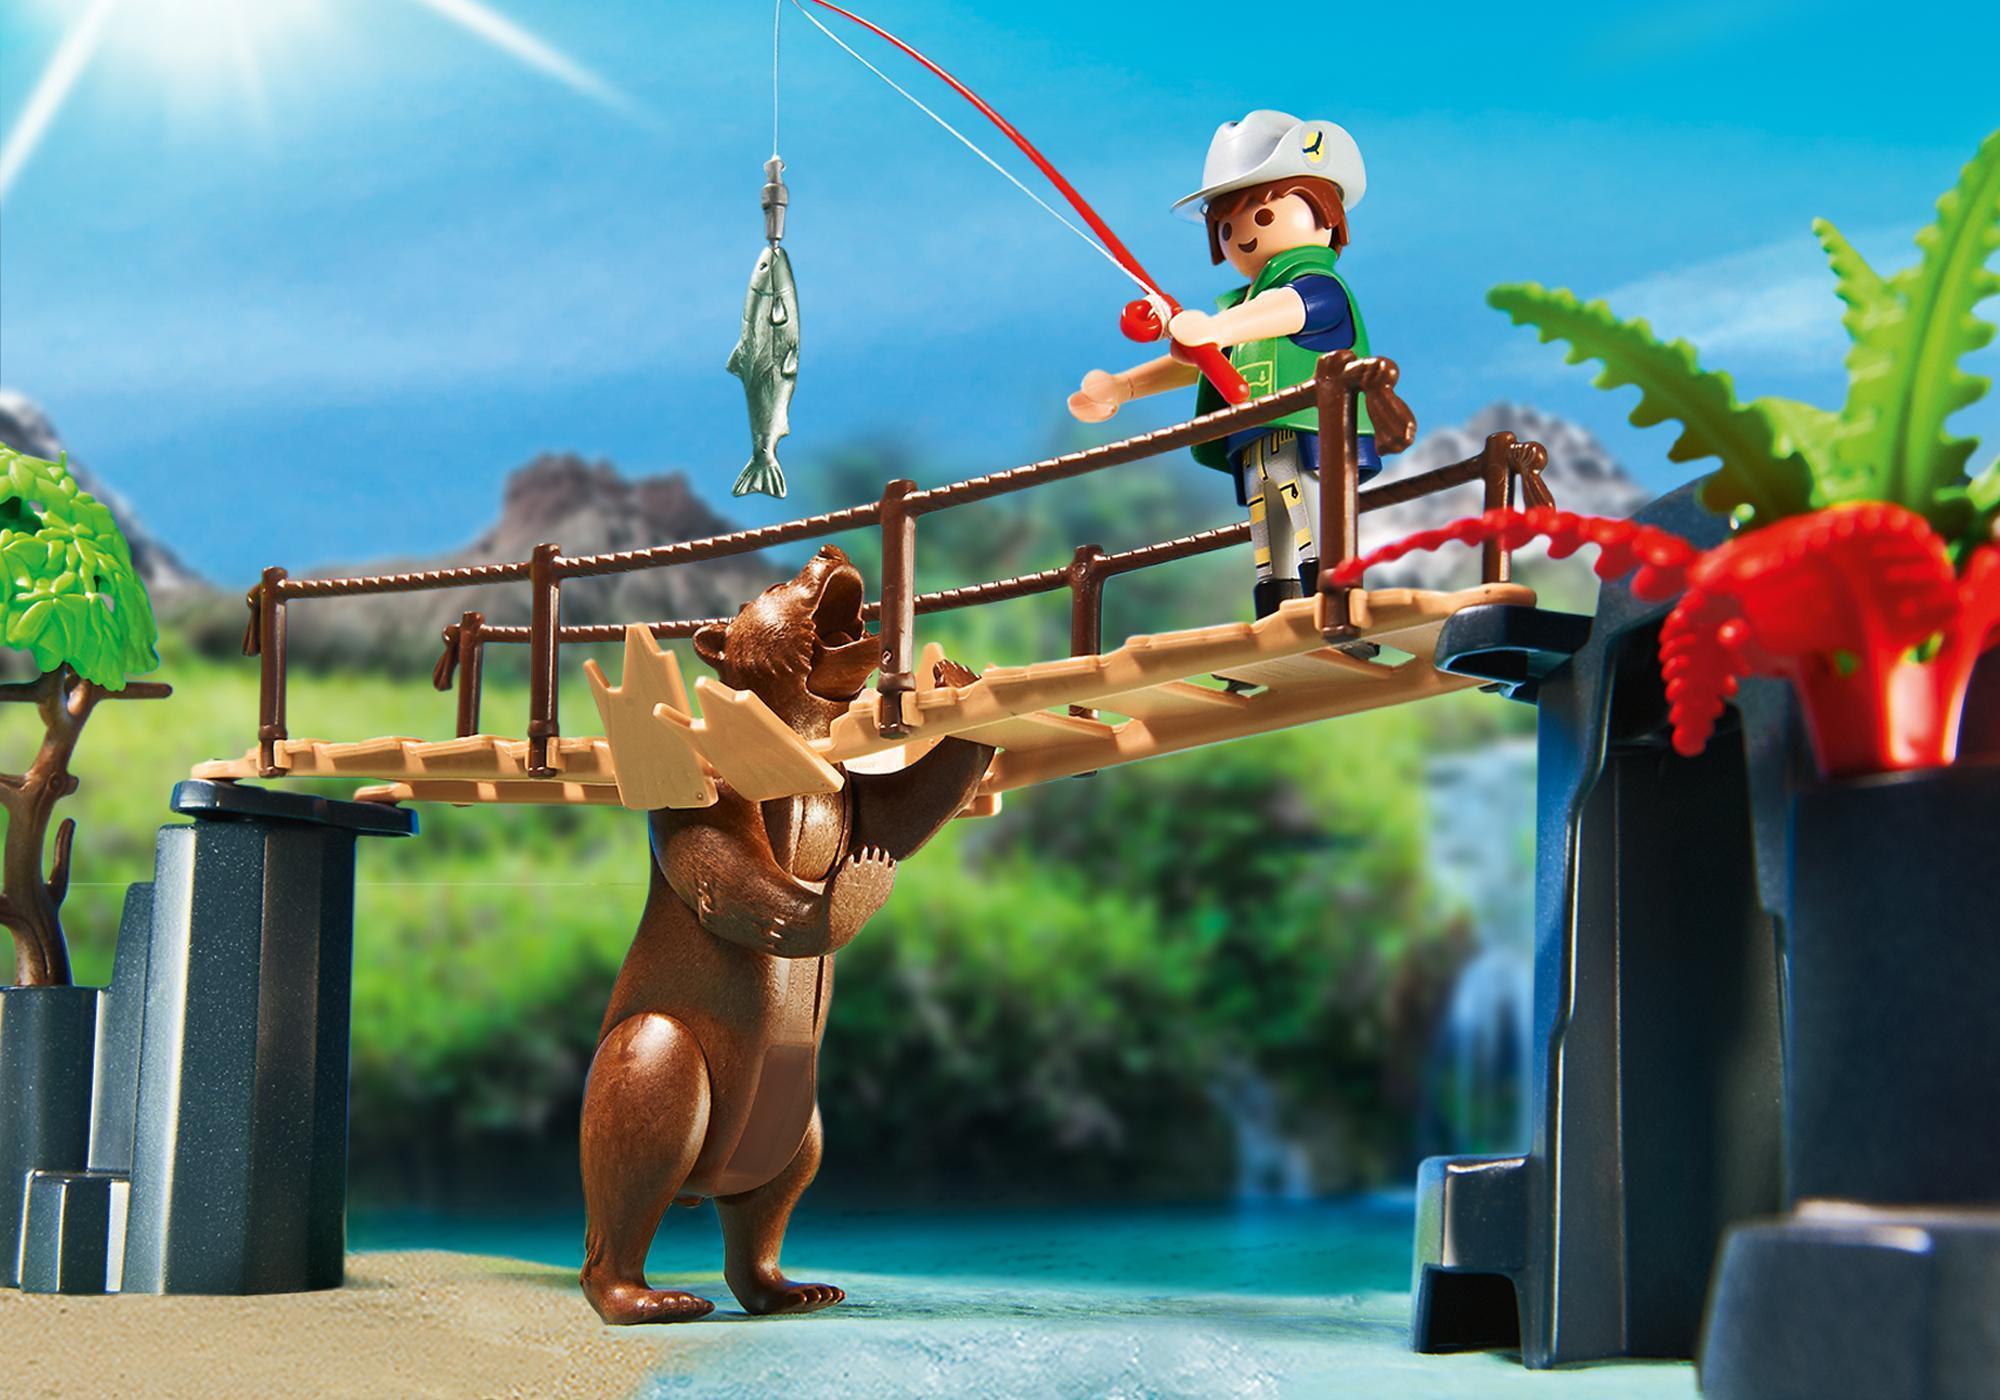 http://media.playmobil.com/i/playmobil/5557_product_extra1/Adventure Tree House